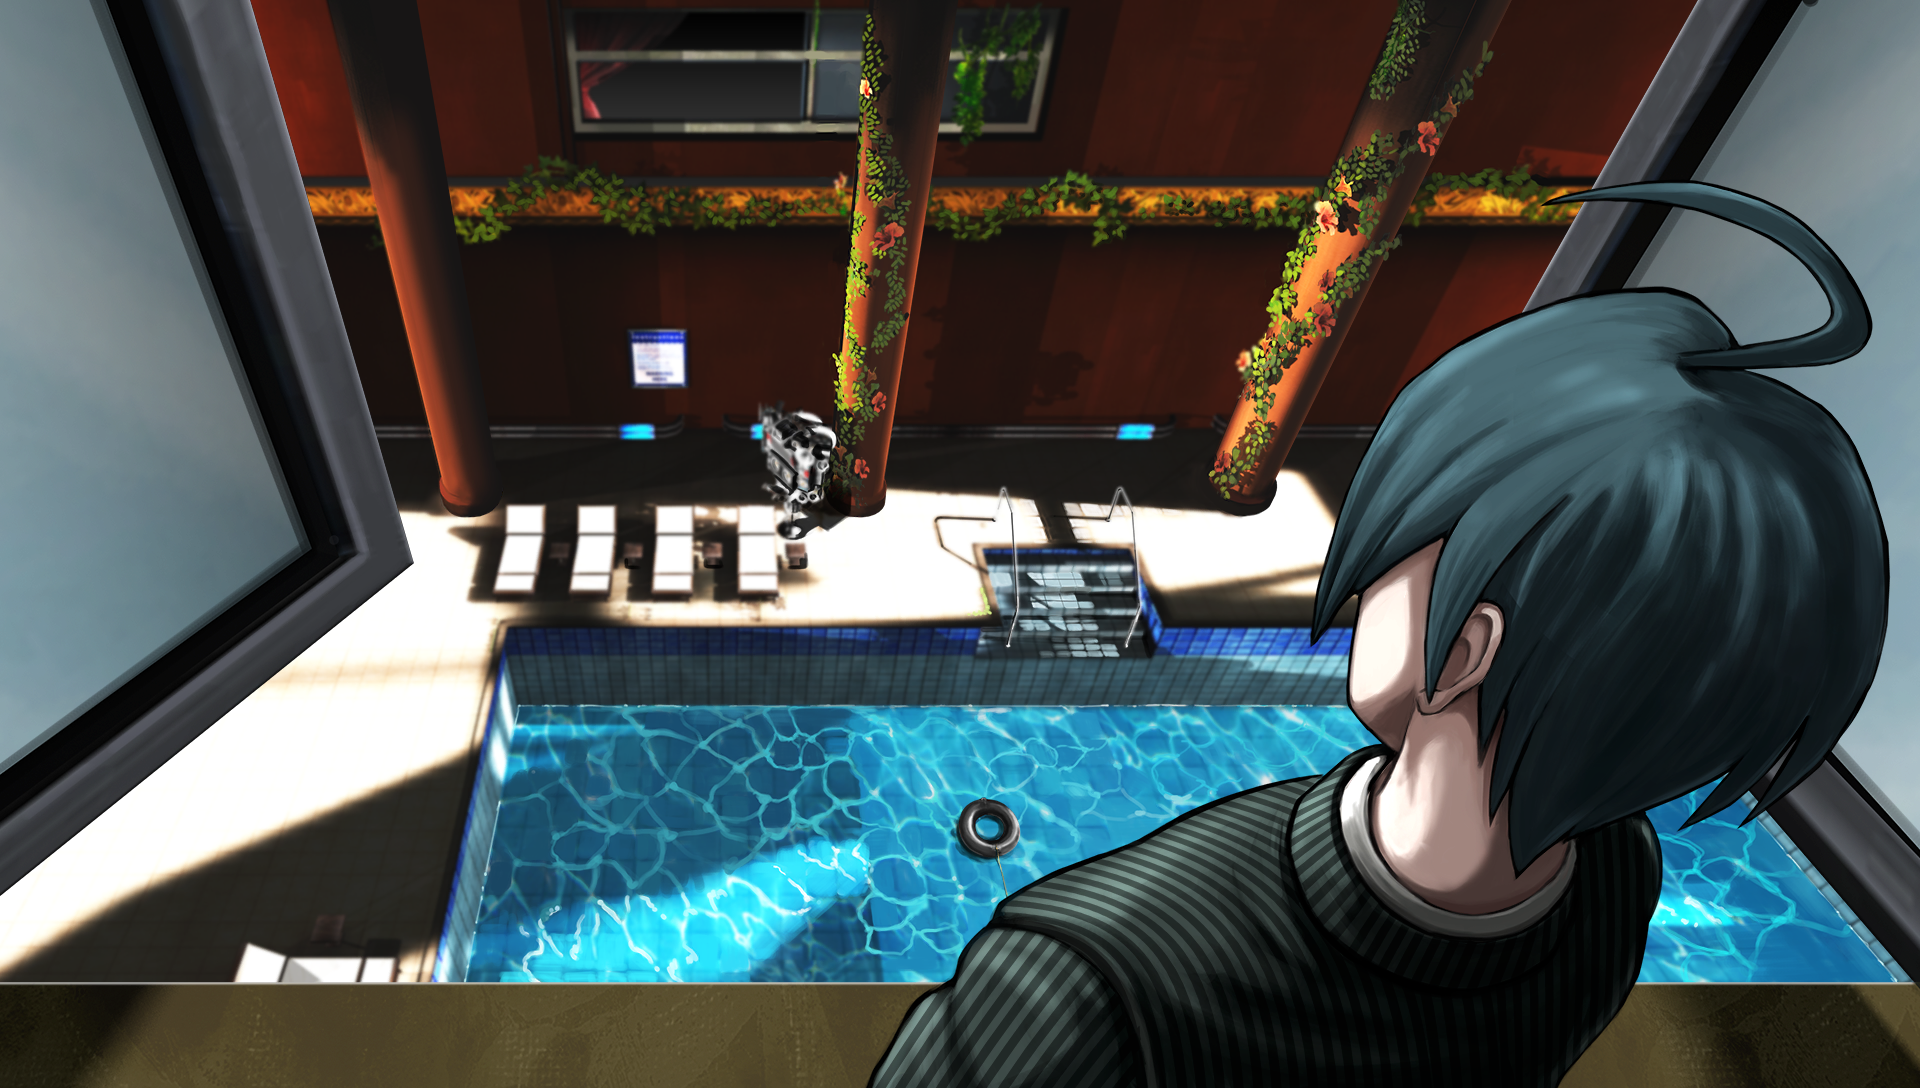 Image - Danganronpa V3 CG - Shuichi Saihara investigating the pool ...